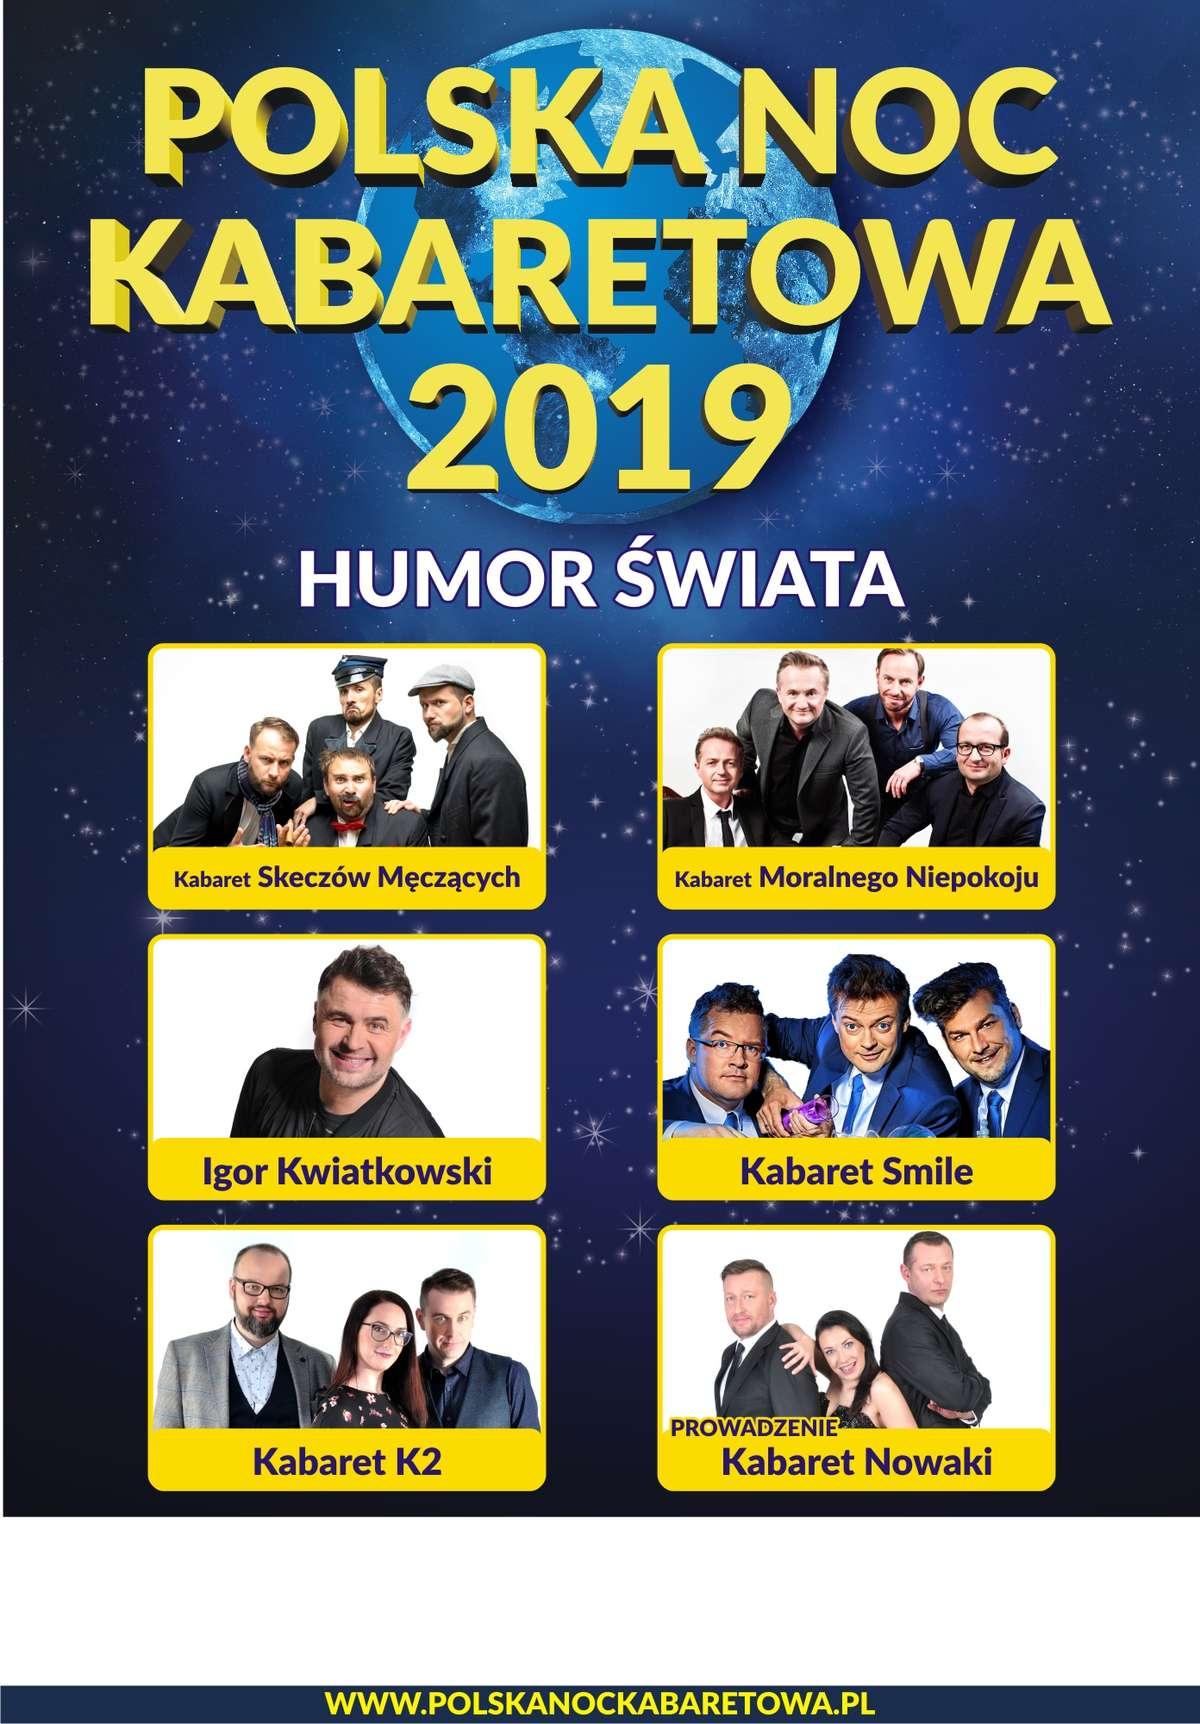 Polska Noc Kabaretowa 2019 - Humor świata - full image